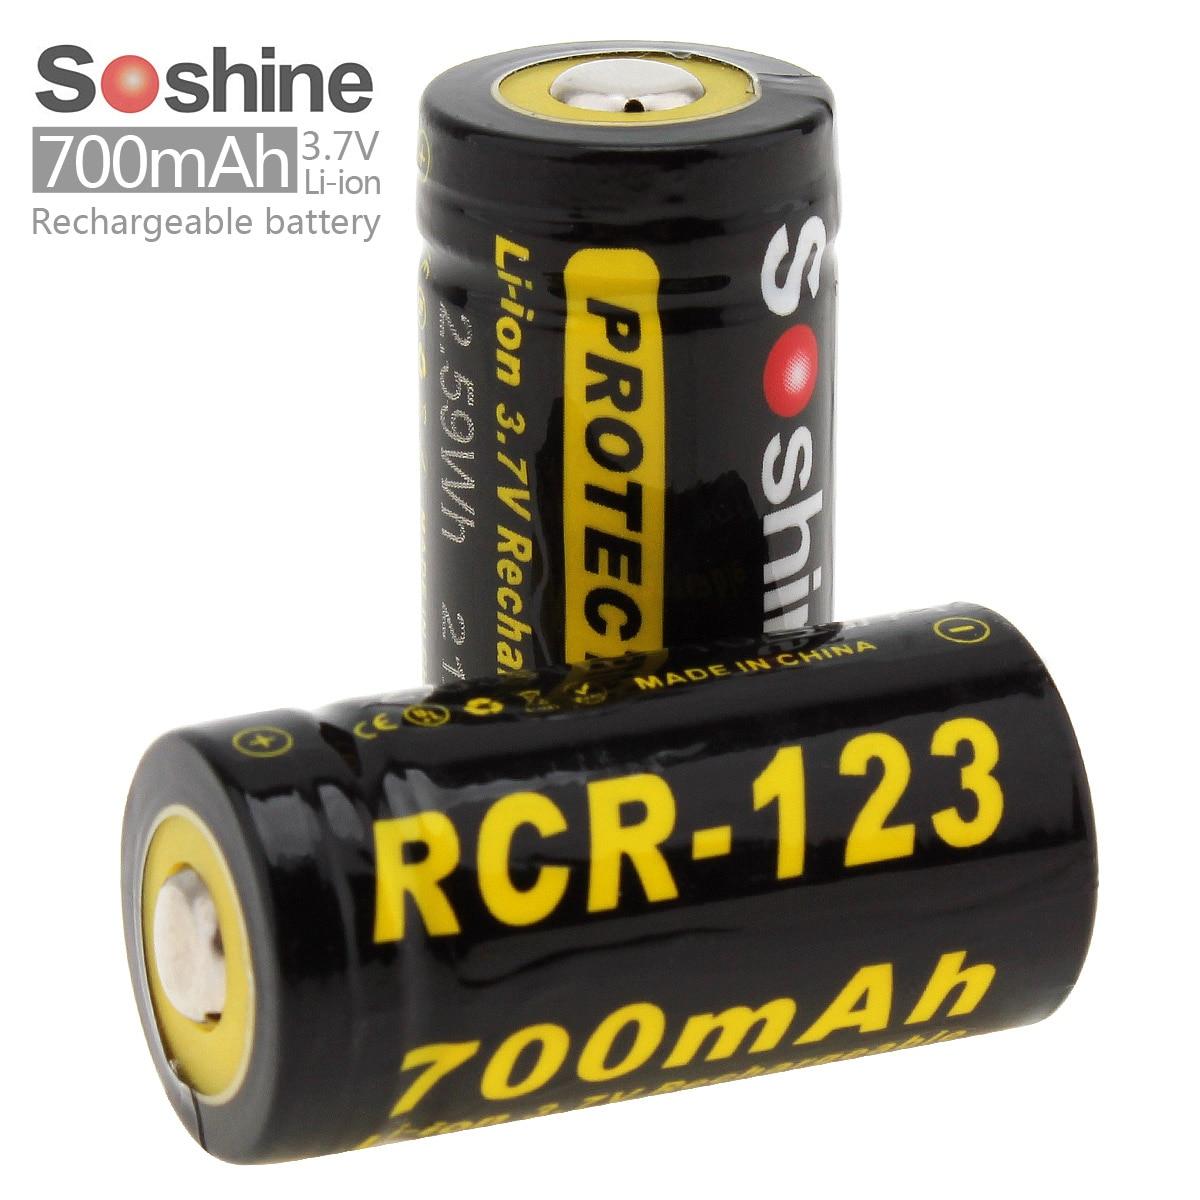 2pcs soshine li ion rcr123 battery 700mah 3 7v protected. Black Bedroom Furniture Sets. Home Design Ideas